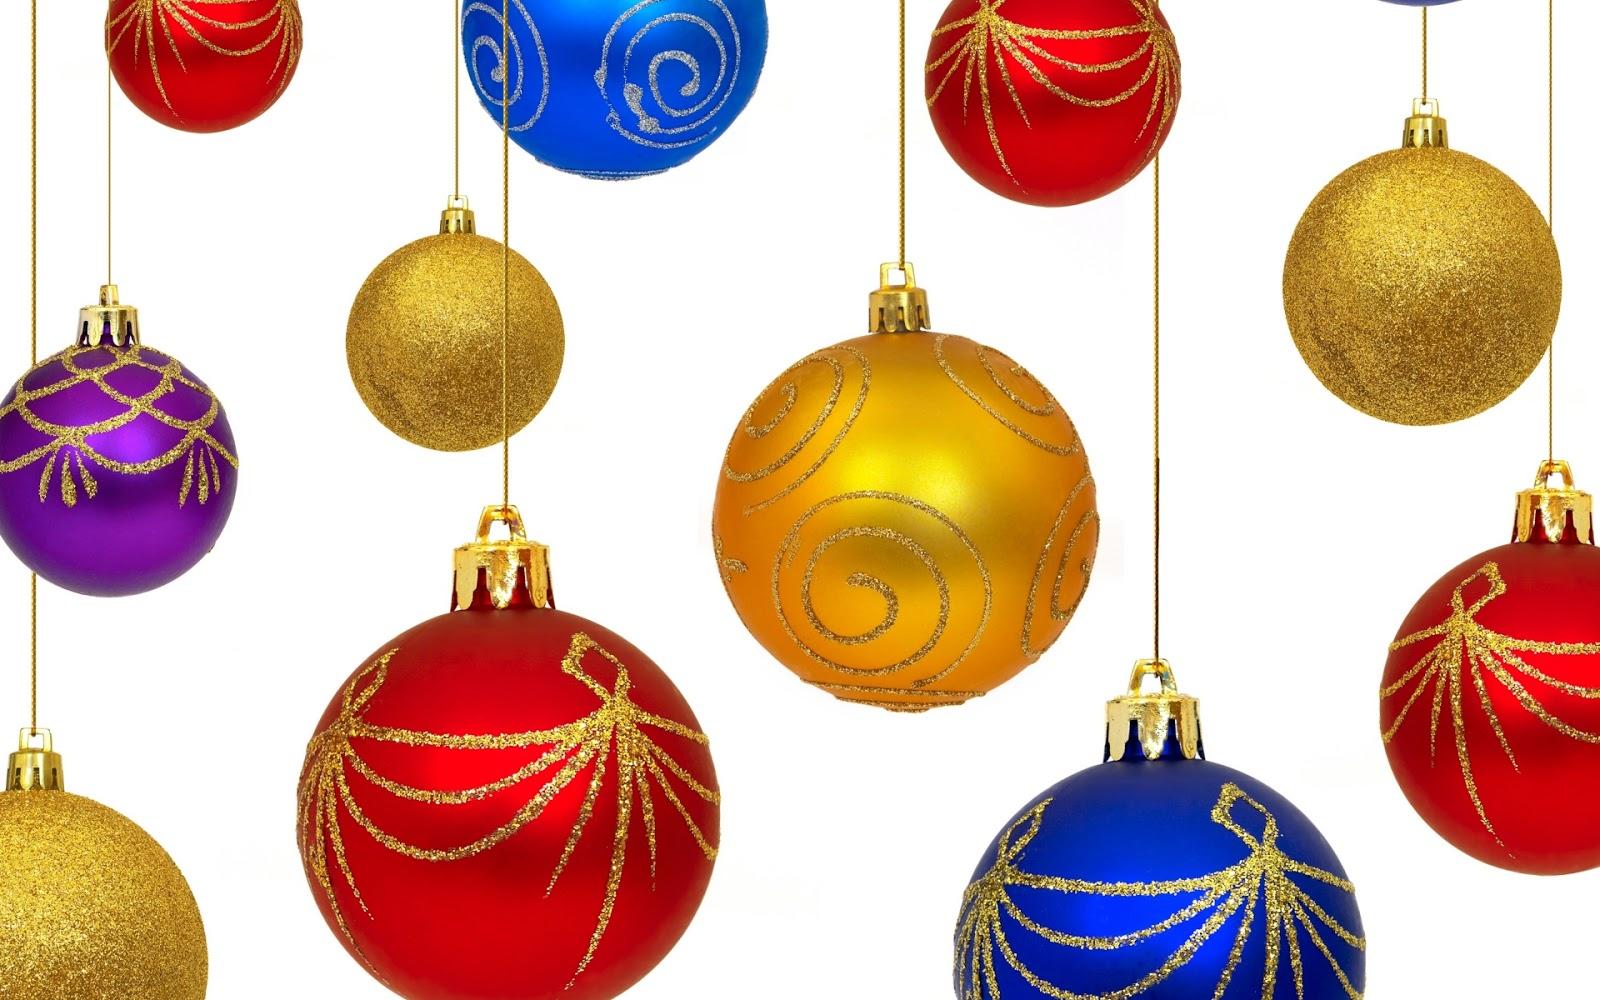 De Navidad Imagenes - GIFS ANIMADOS Hellokids